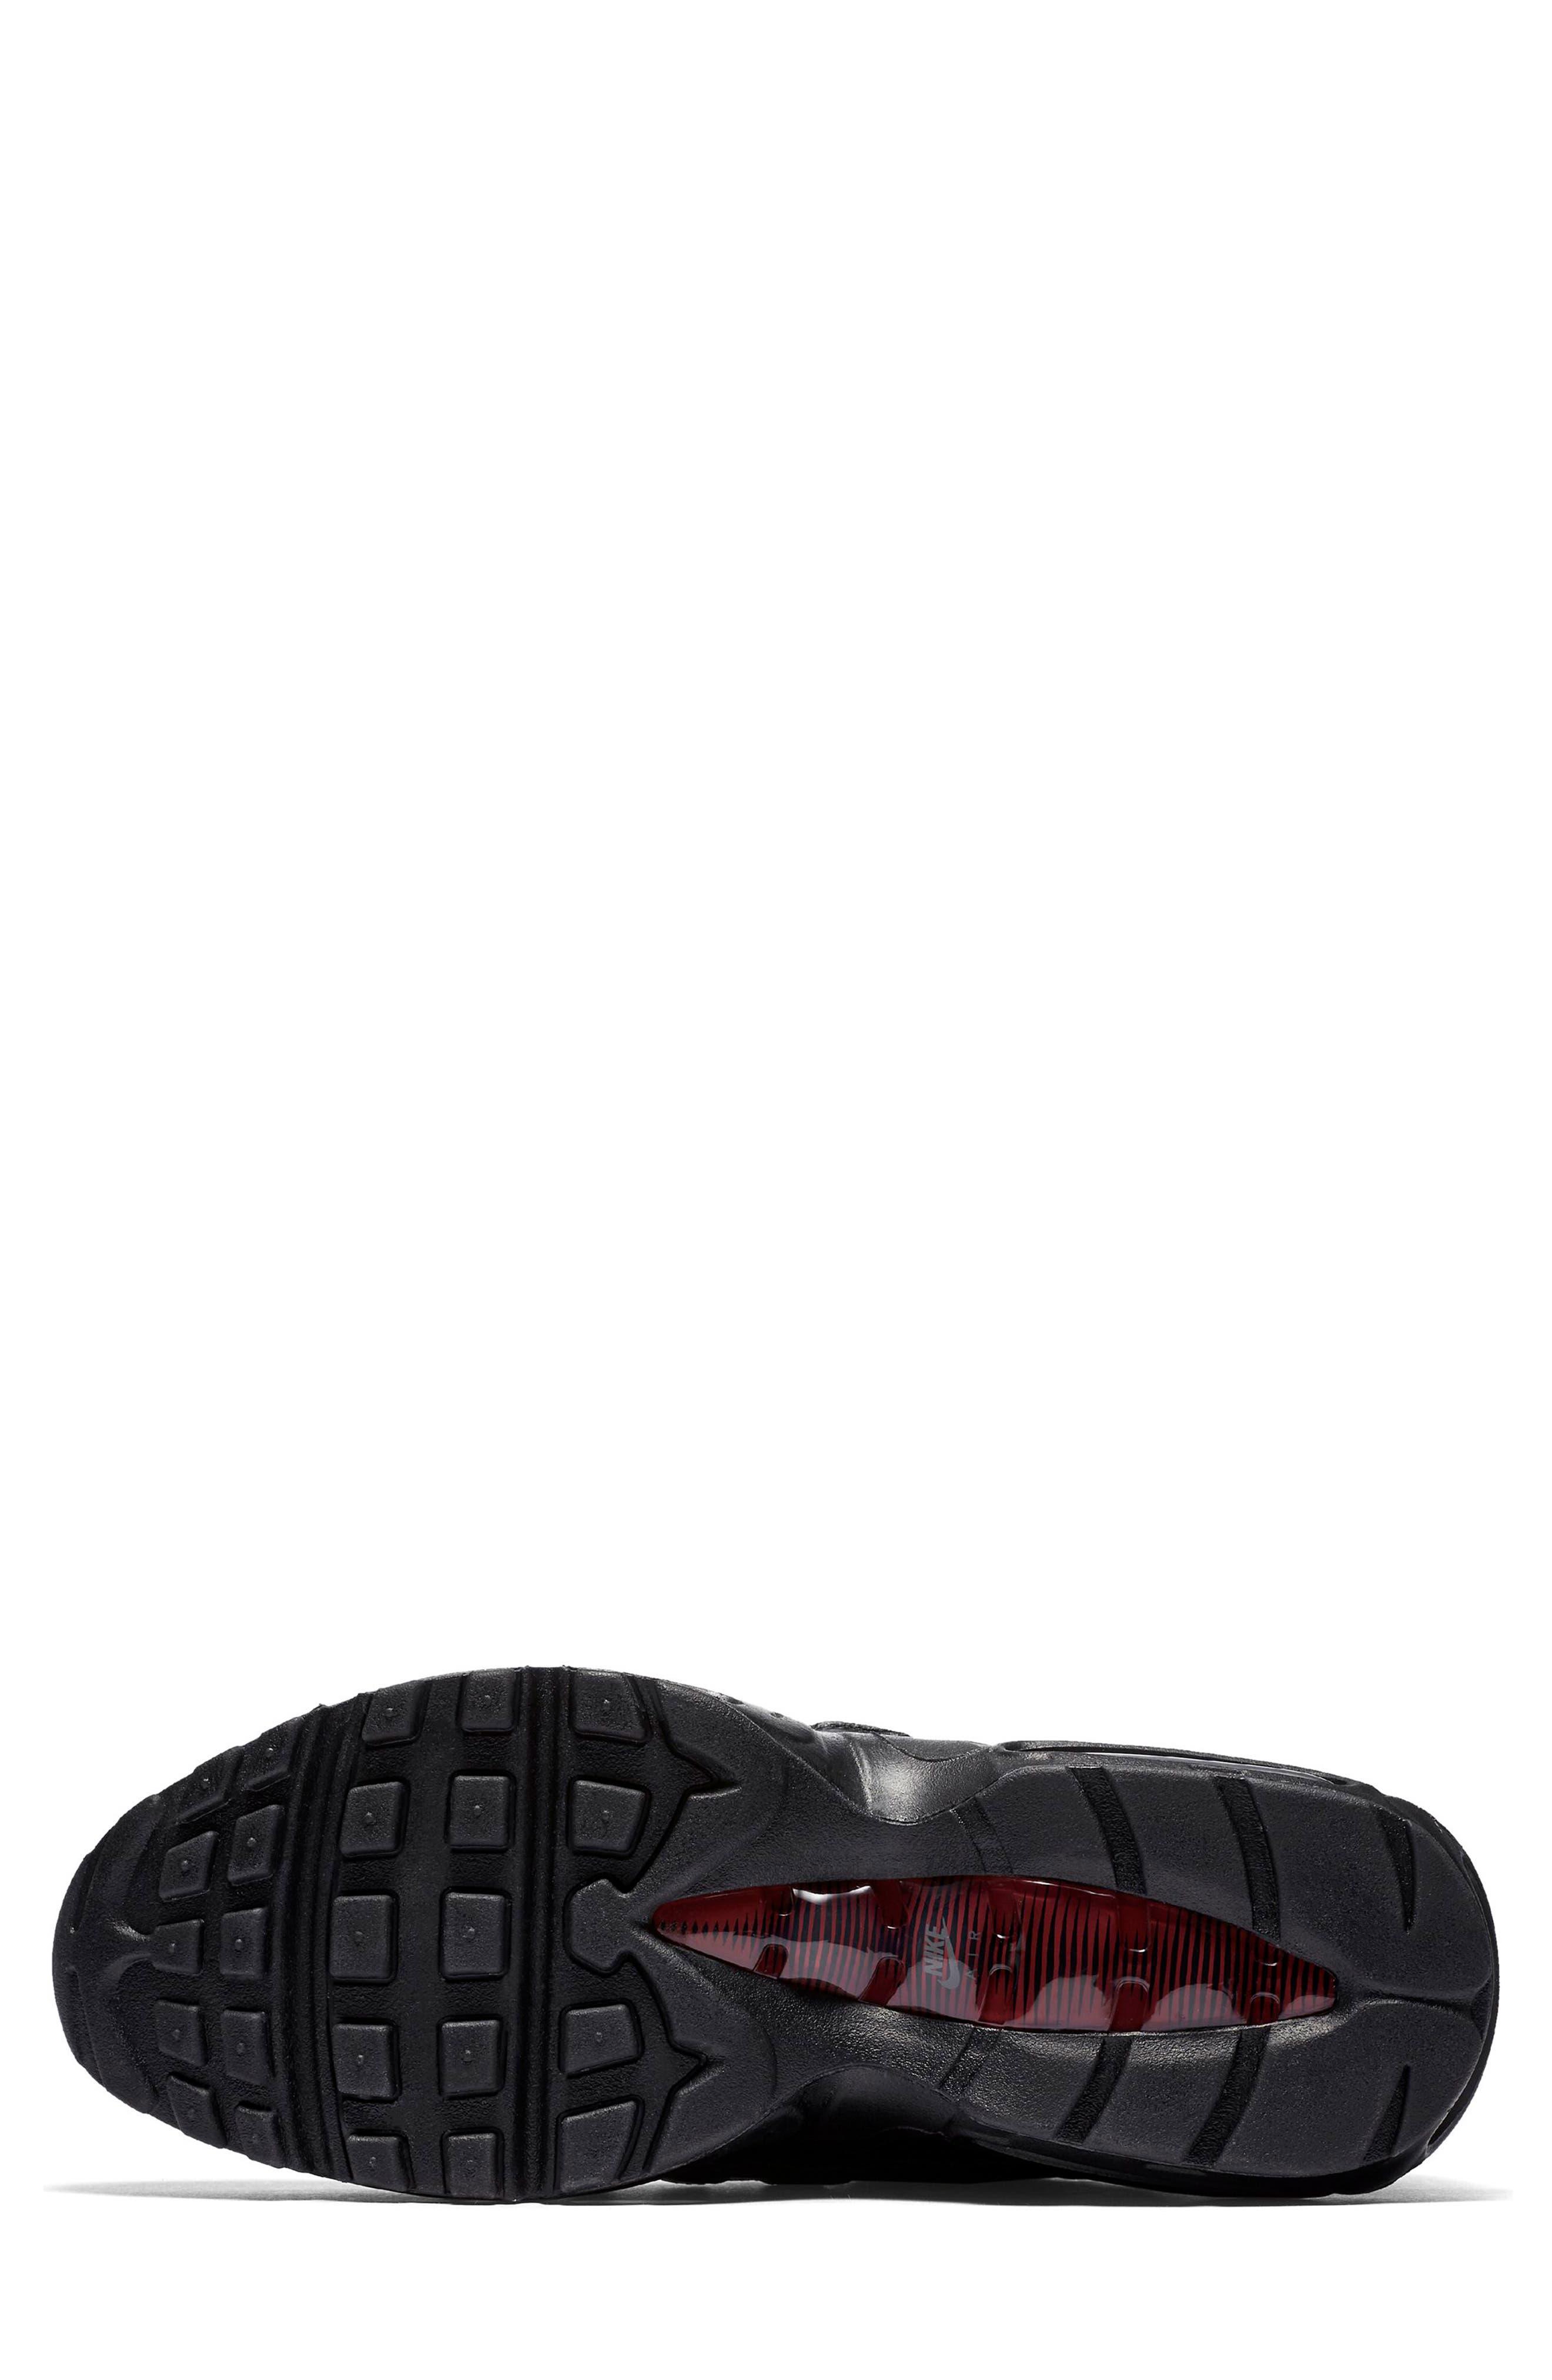 Air Max 95 NRG Sneaker,                             Alternate thumbnail 5, color,                             BLACK/ TEAM RED/ ANTHRACITE